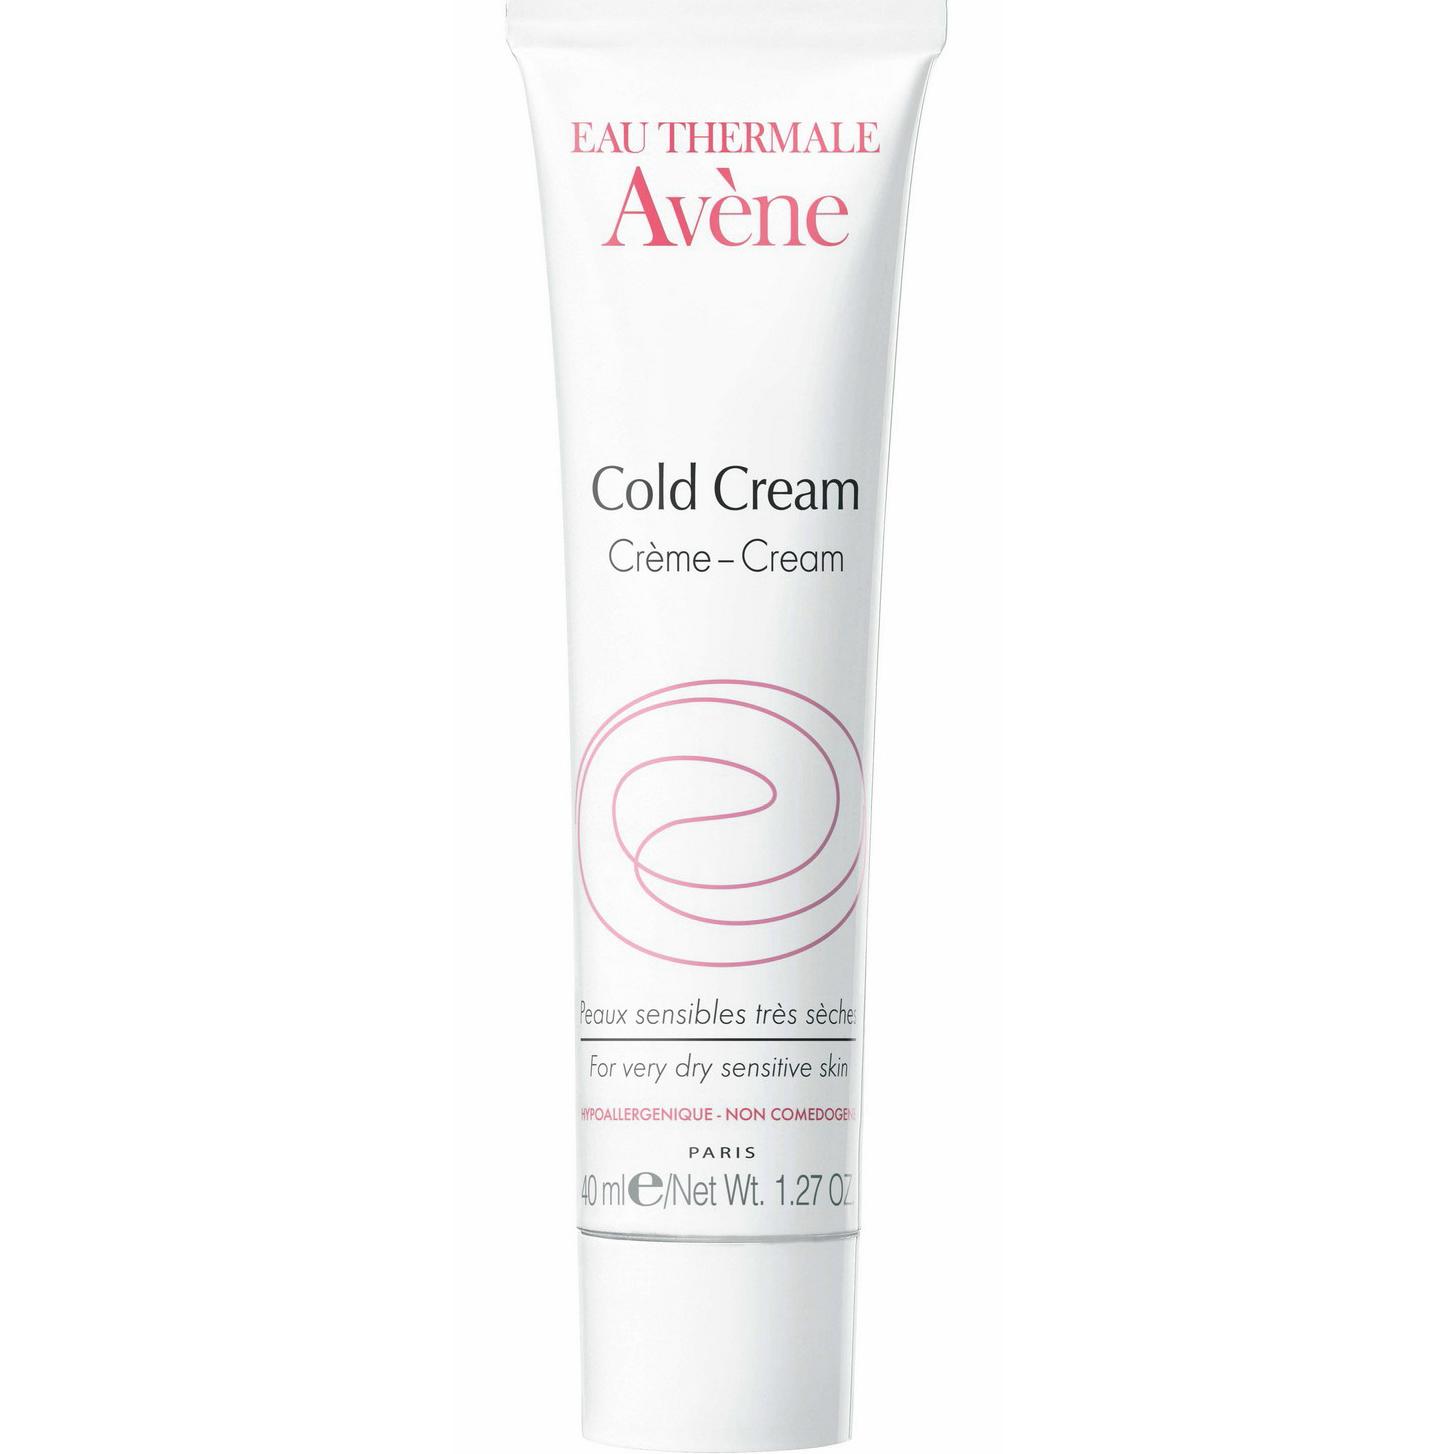 Avene Cold Cream Θεραπευτική Προστατευτική ΚρέμαΠροσώπου για Βρέφη, Παιδιά & Ενήλικες 40ml